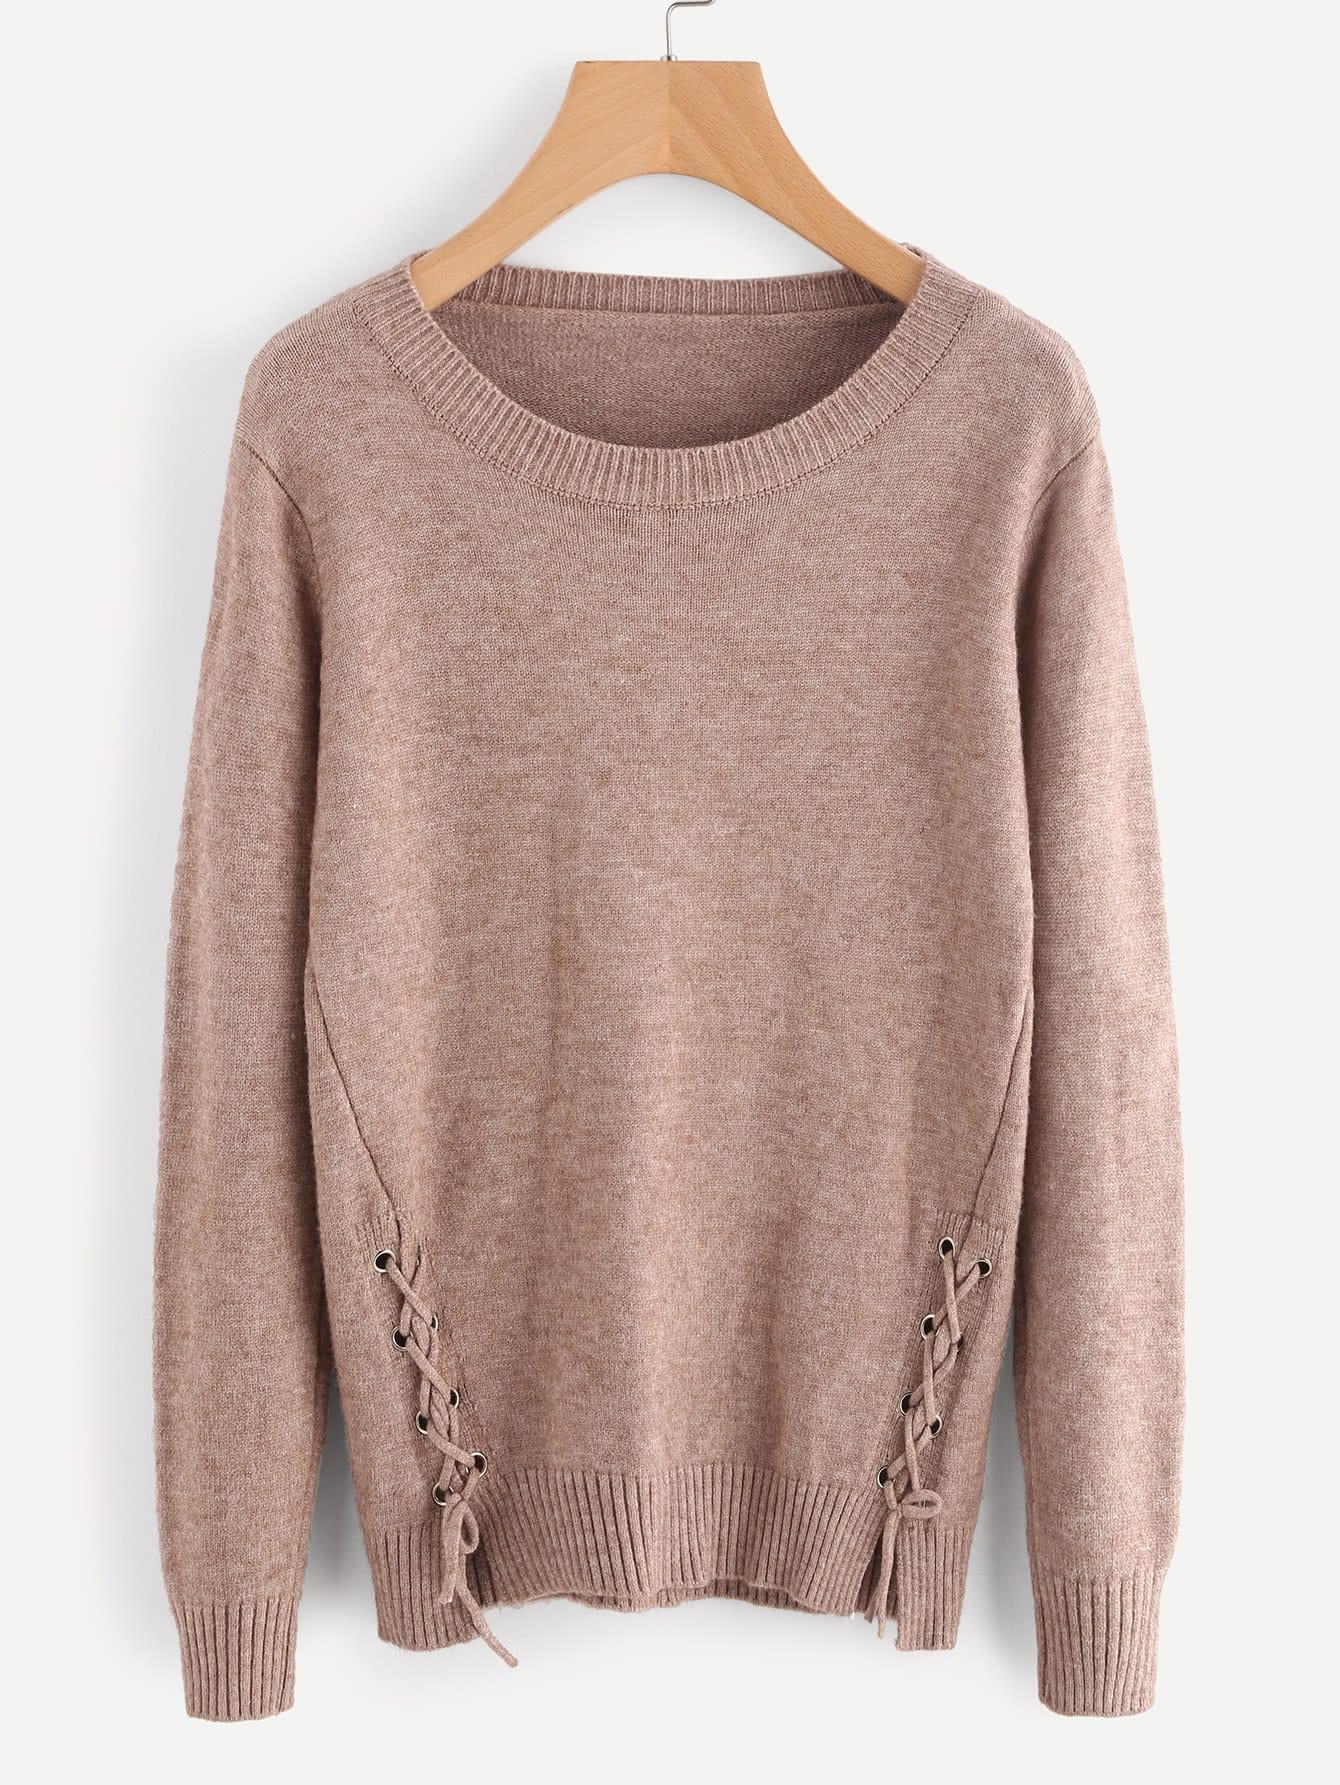 Lace Up Side Slub Sweater sweater170830103